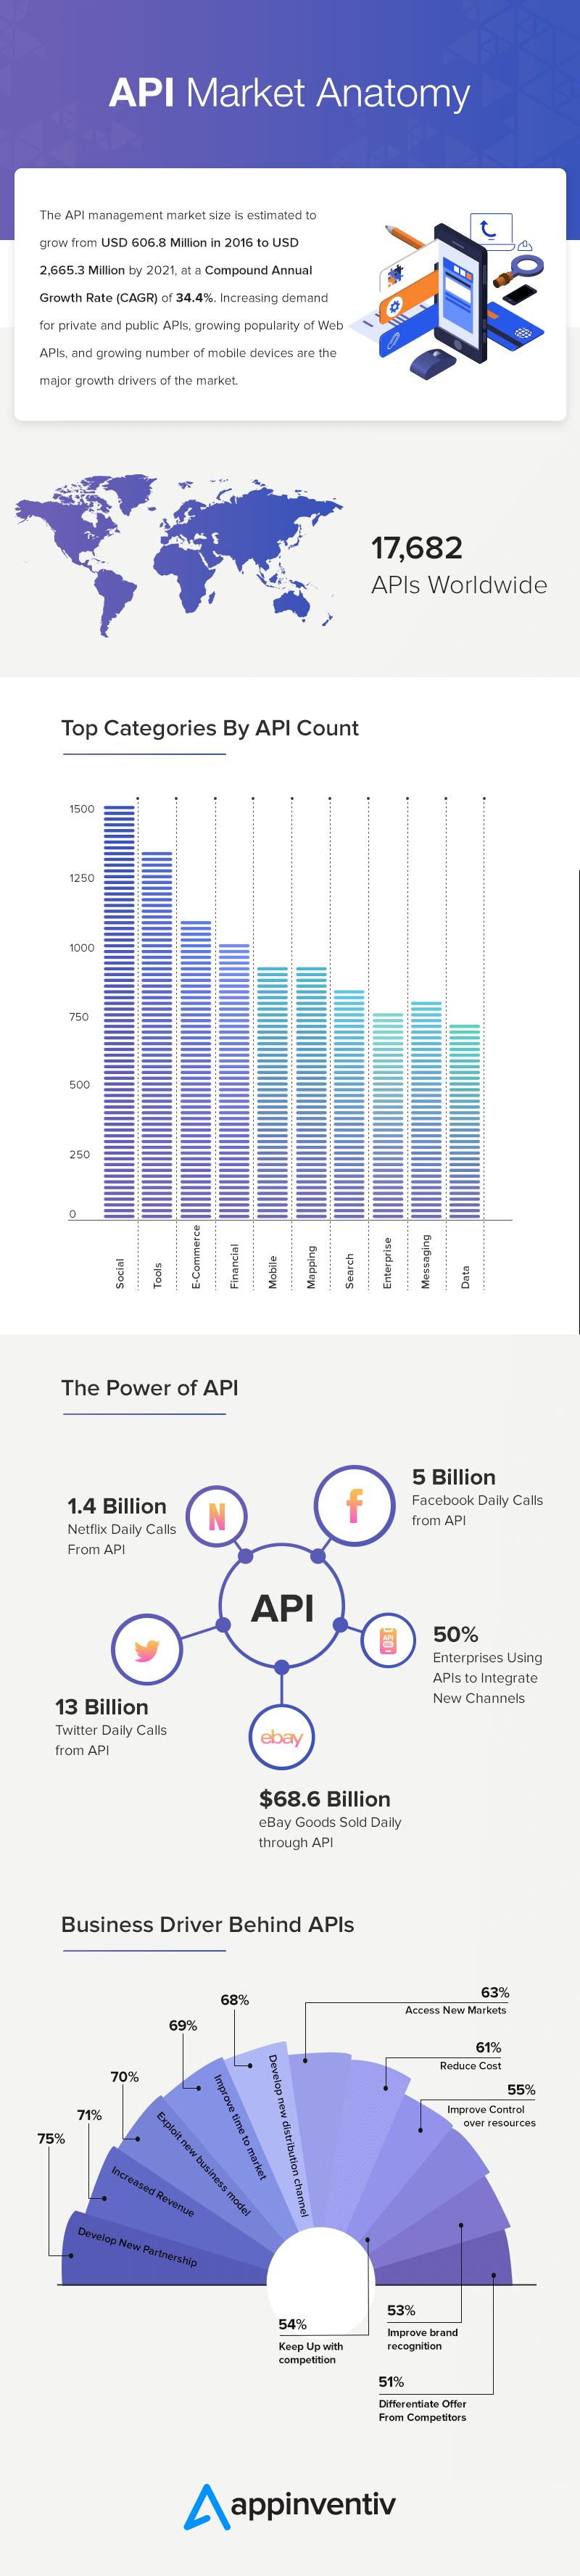 Anatomy of The Growing API Market